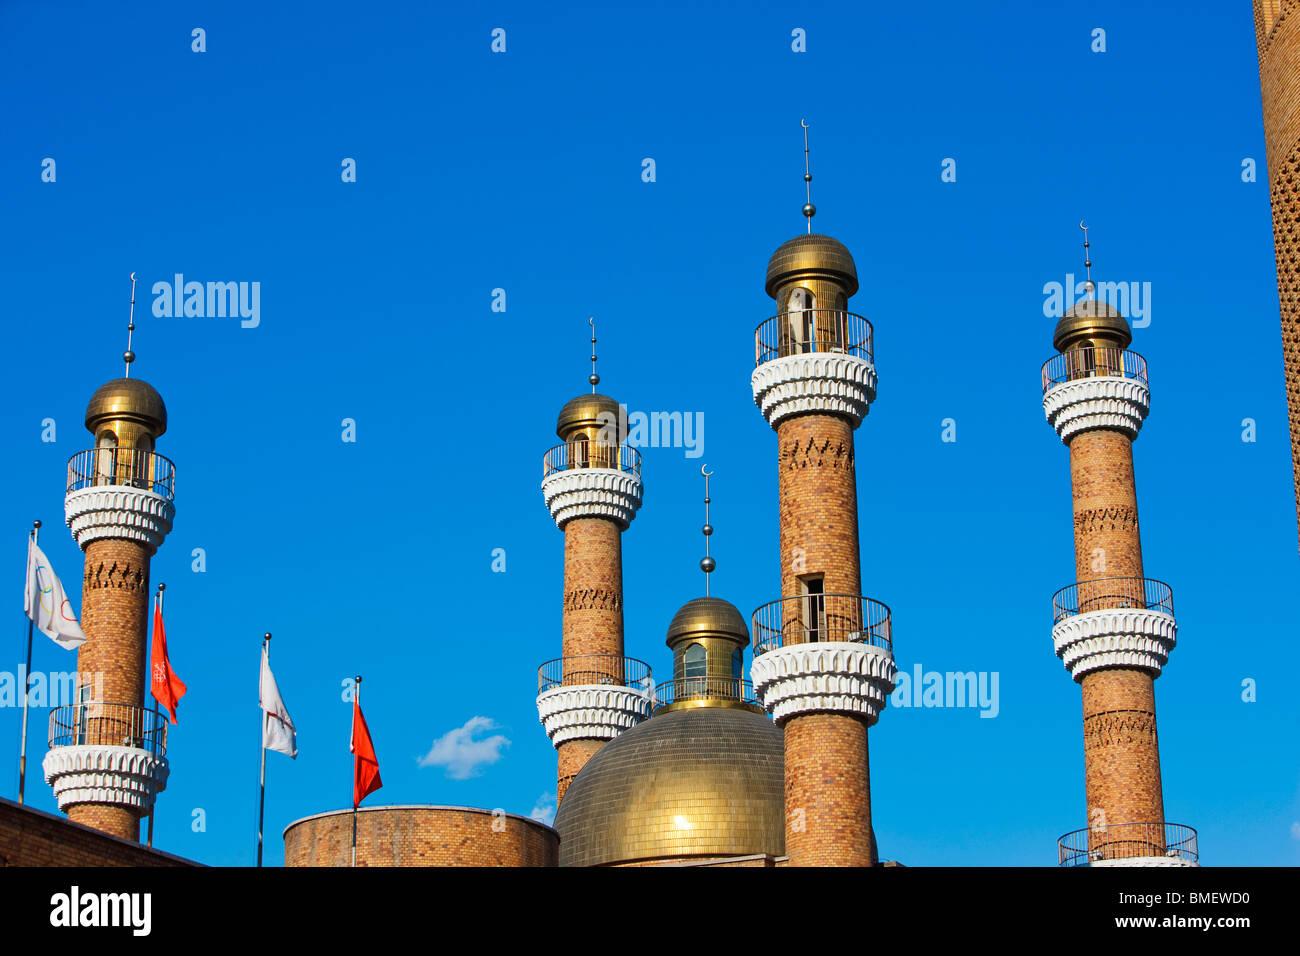 Folk Arts Museum, International Grand Bazaar, Urumqi, Xinjiang Uyghur Autonomous Region, China - Stock Image